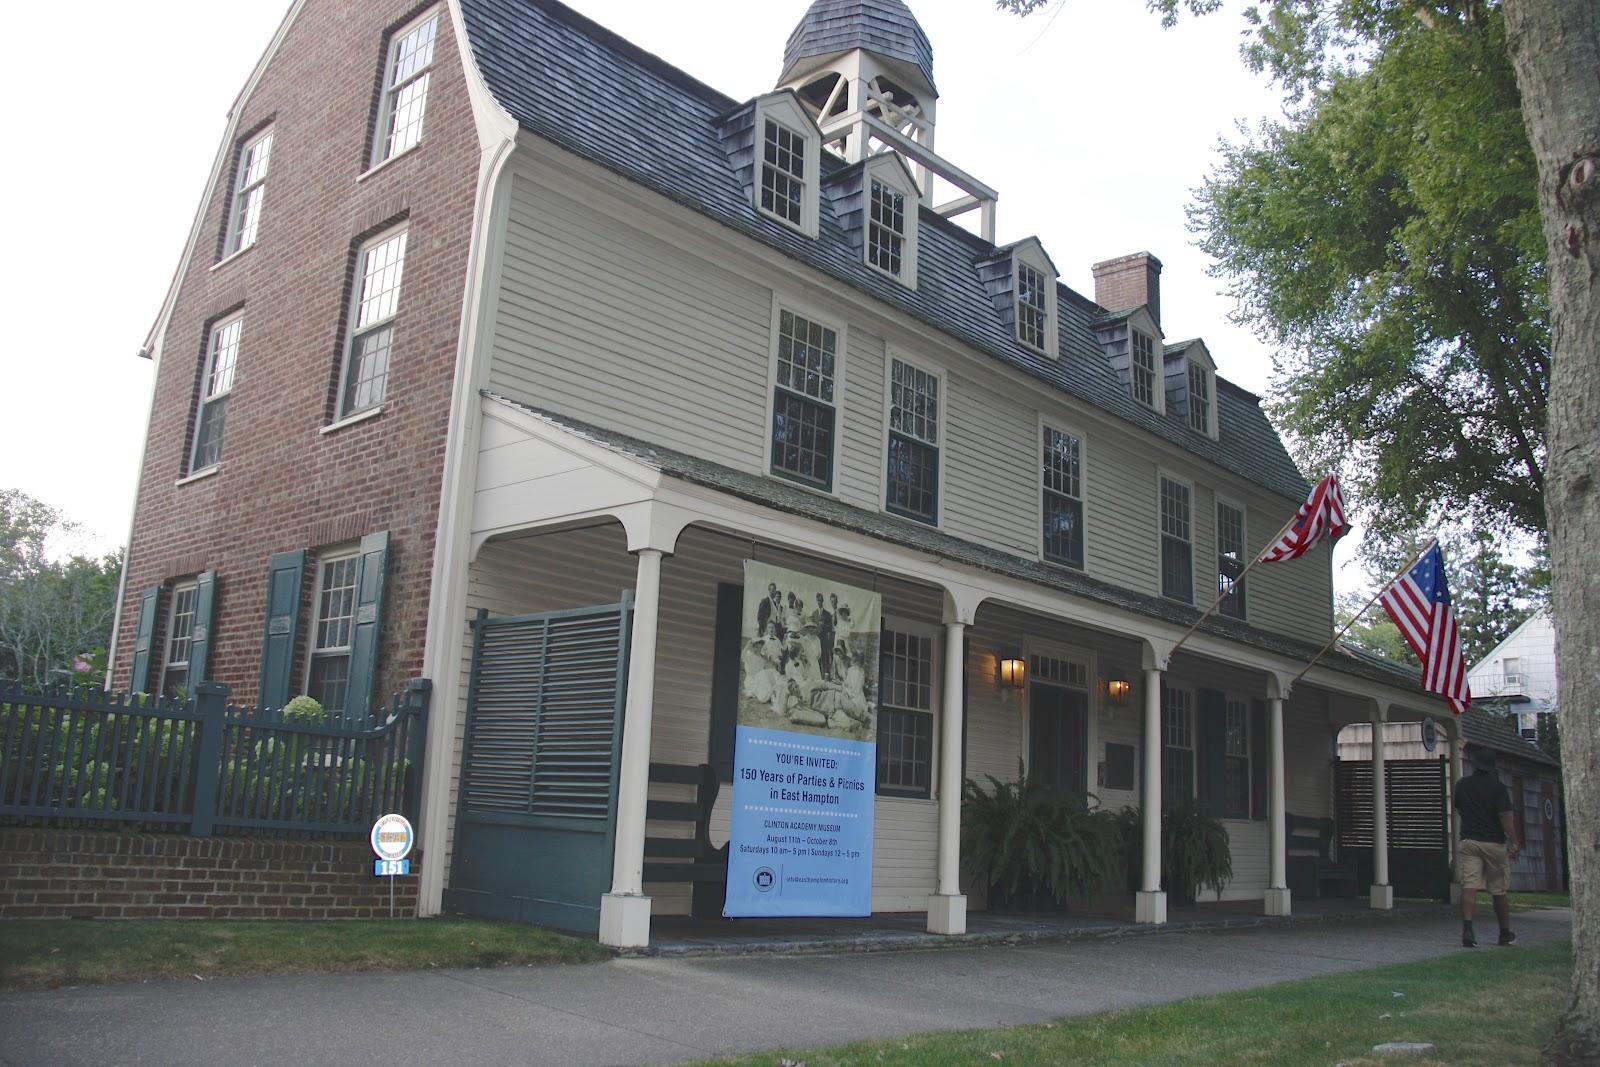 historical east hampton home by chango&co | Museum Association of New York - East Hampton Historical ...